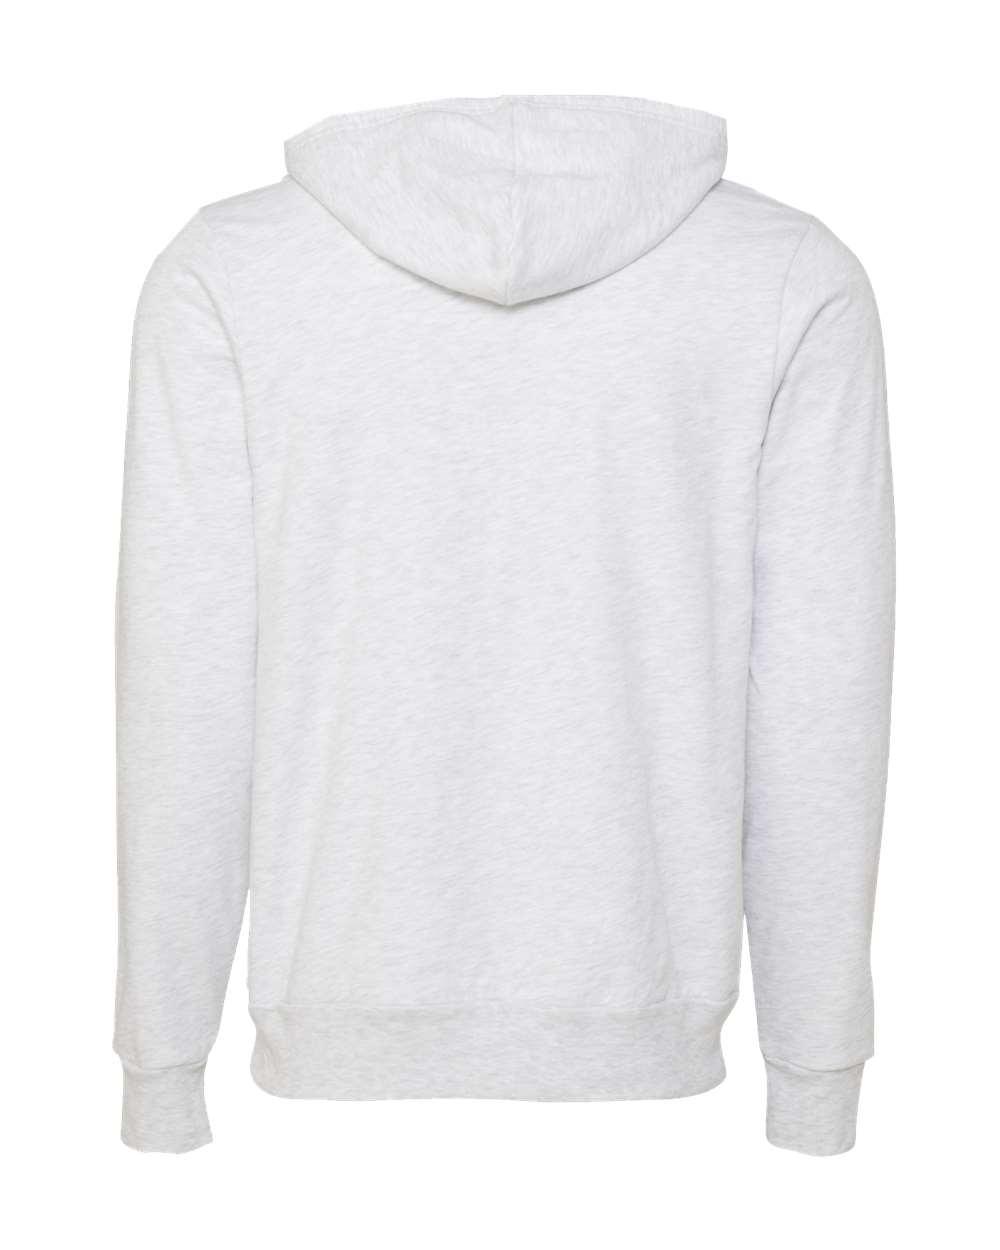 Bella-Canvas-Unisex-Full-Zip-Up-Hooded-Sweatshirt-Blank-Hoodie-3739-up-to-3XL thumbnail 6